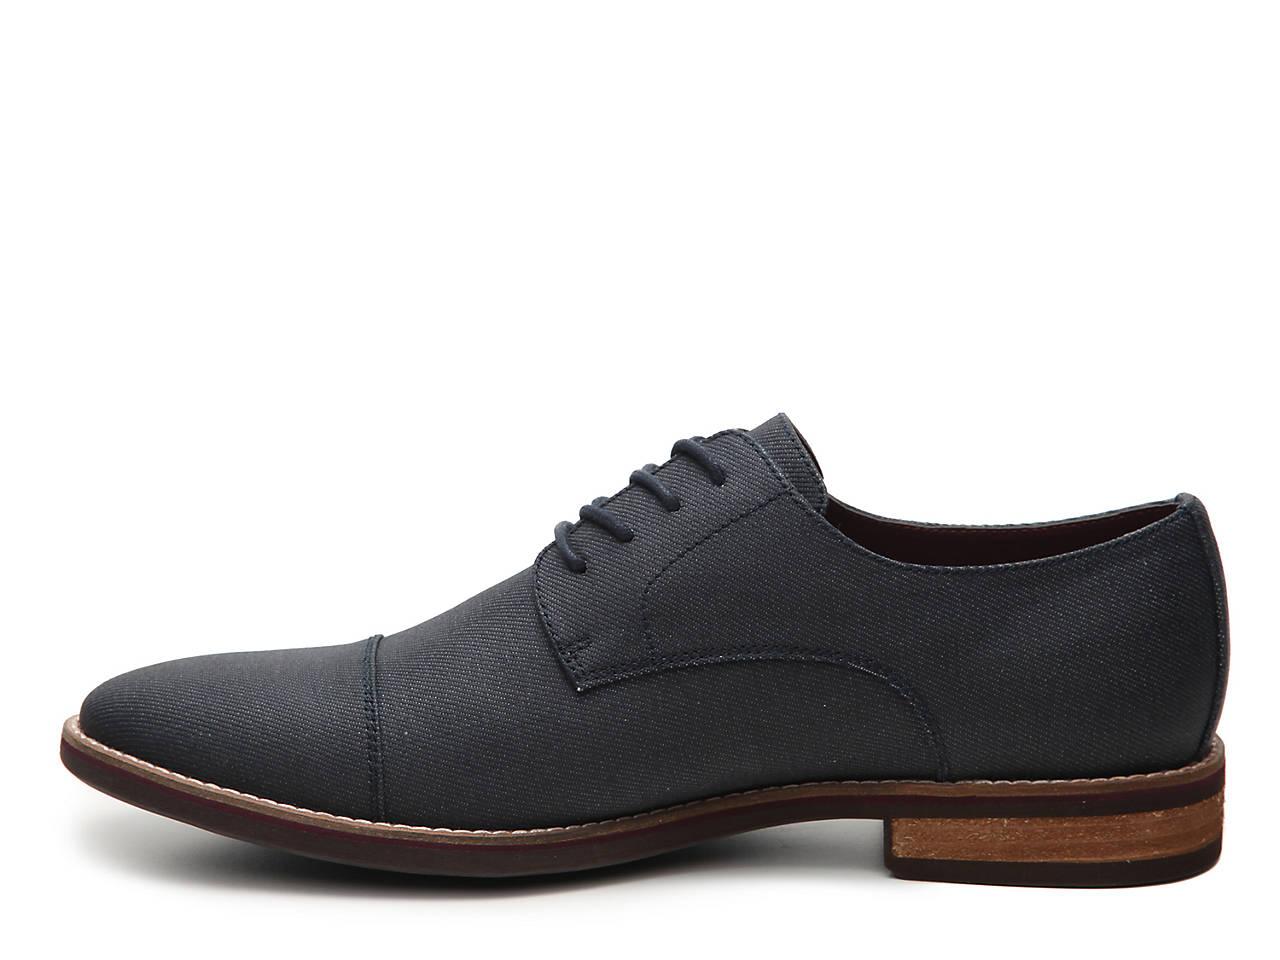 timeless design 852e1 6d5de Call It Spring Pingitore Oxford Men s Shoes   DSW